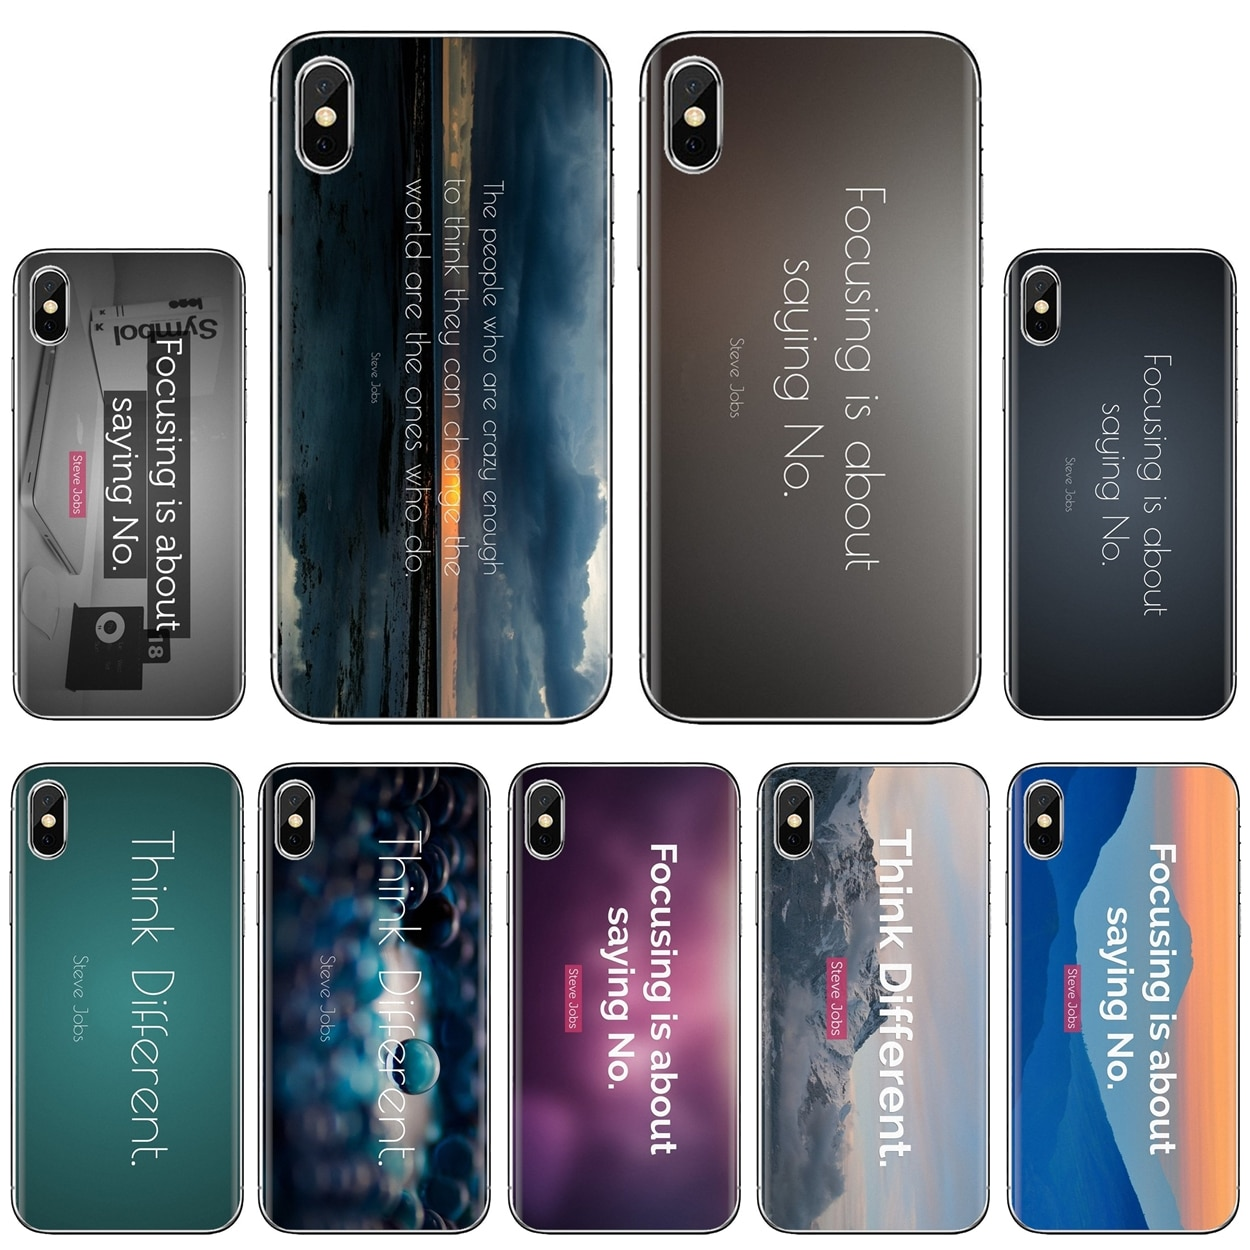 Suave superior inspirador citar Steve Jobs citas para iPhone 11 Pro 4 4S 5 5S SE 5C 6 6S 7 7 8X10 XR XS Plus Max para iPod Touch